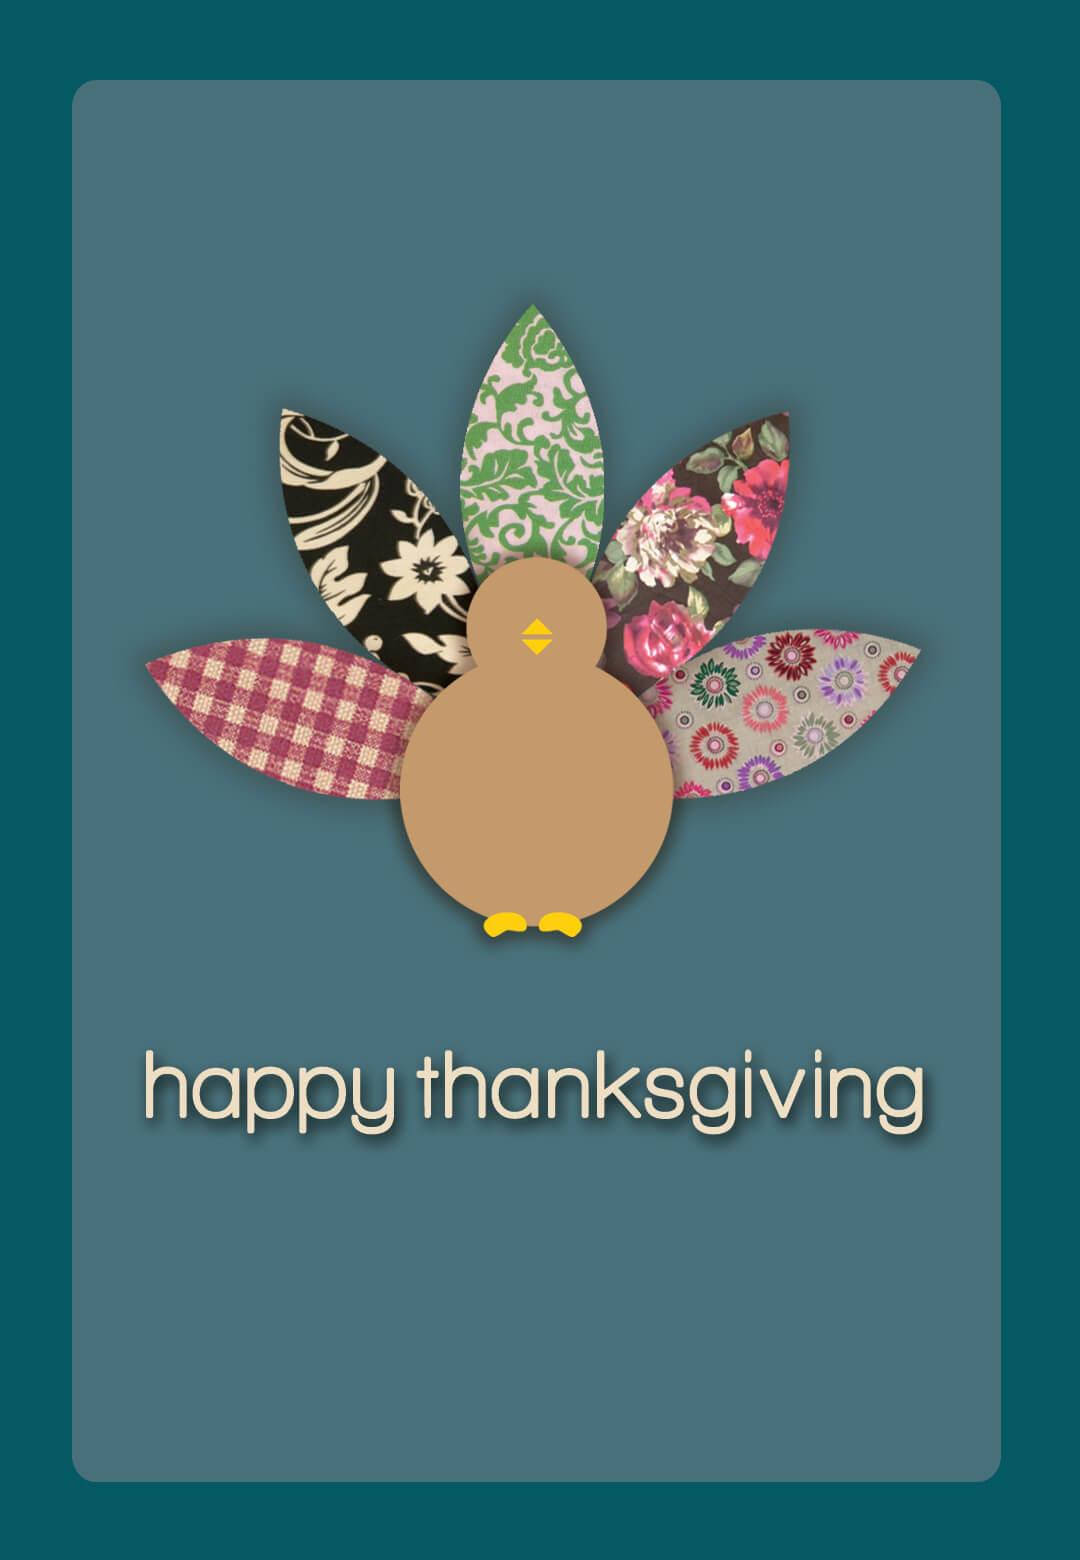 Thanksgiving 2018 Greeting Cards